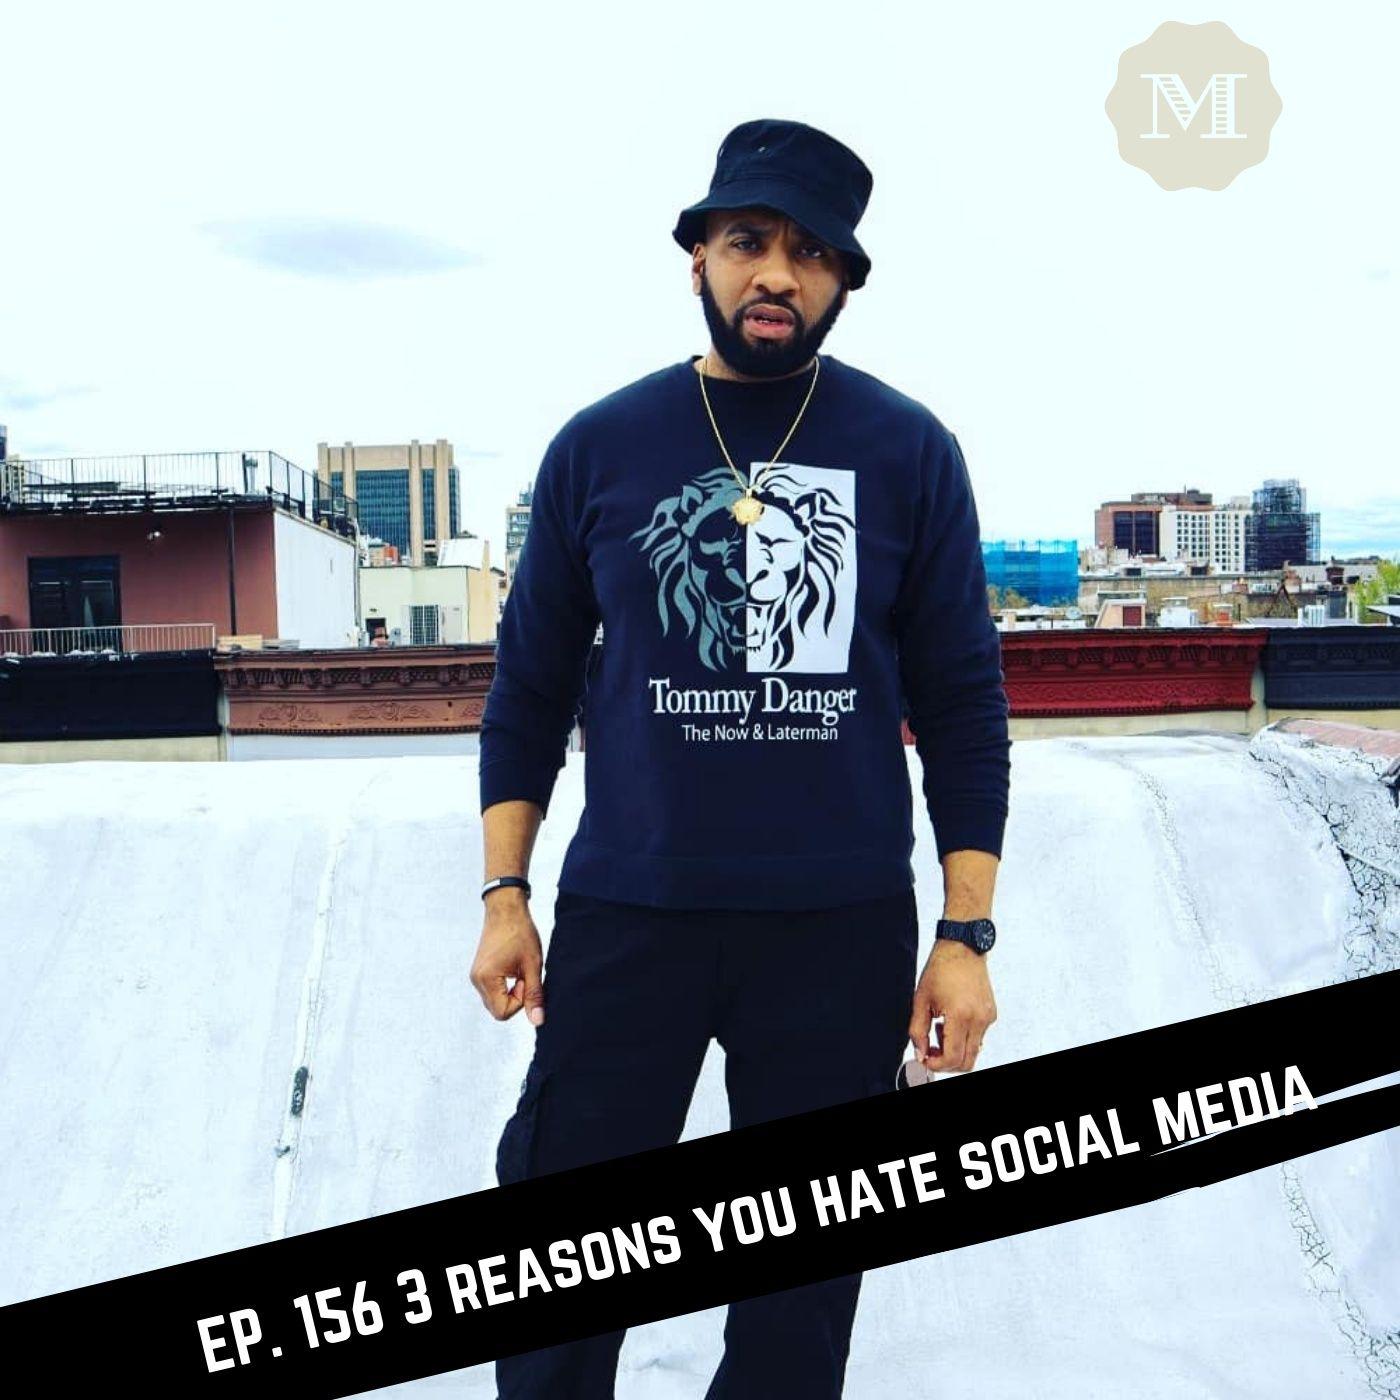 Ep. 156 3 Reasons you hate Social Media